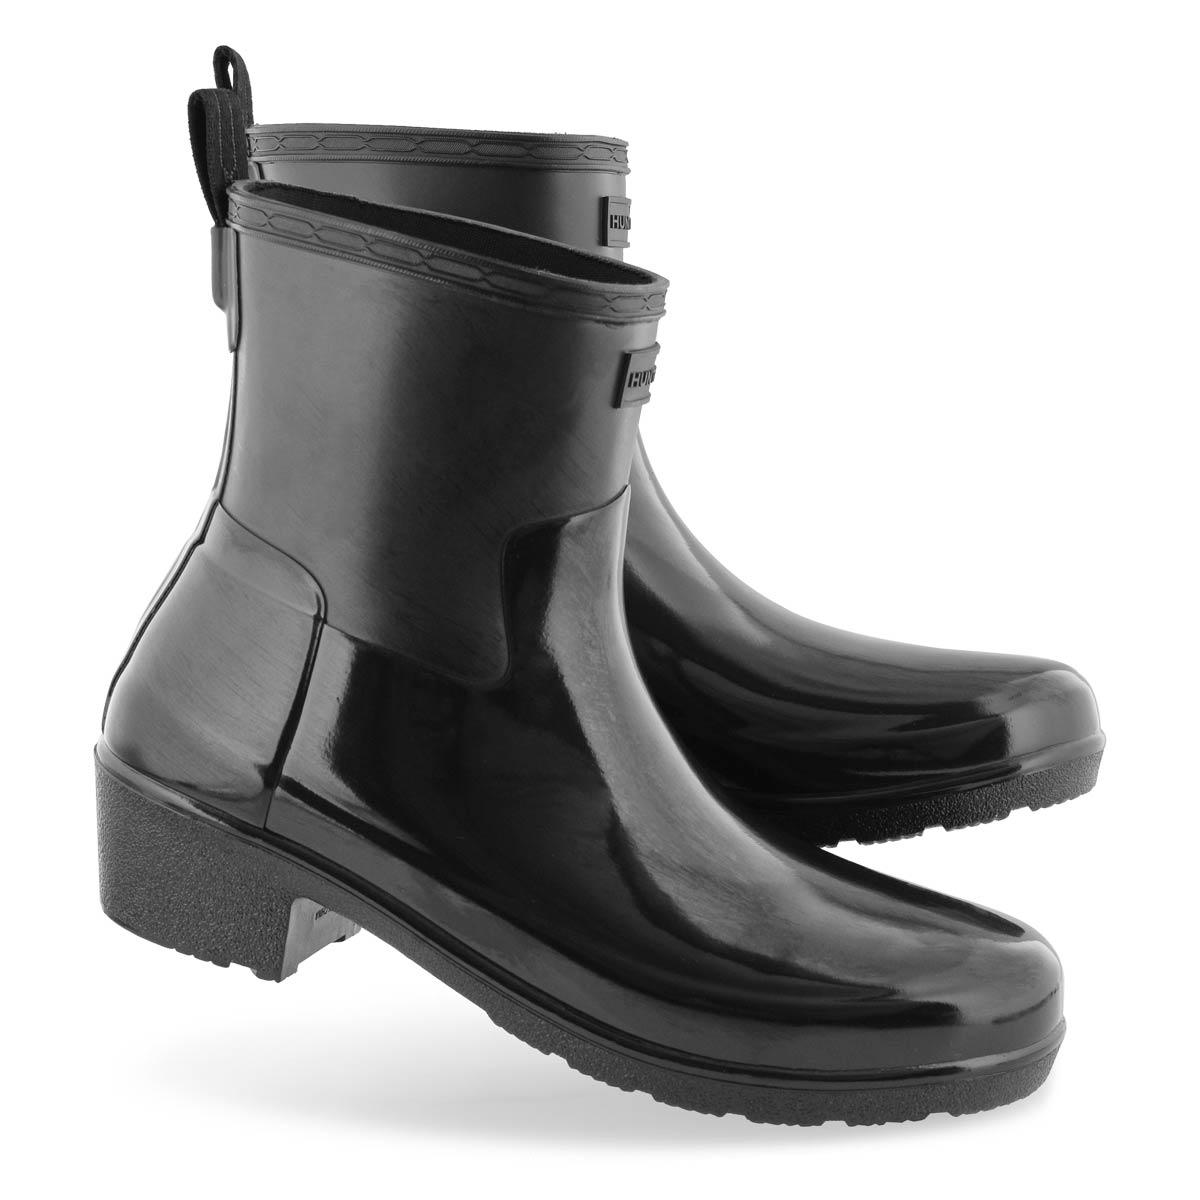 Lds RefinedLoHeelBikerGloss blk rainboot